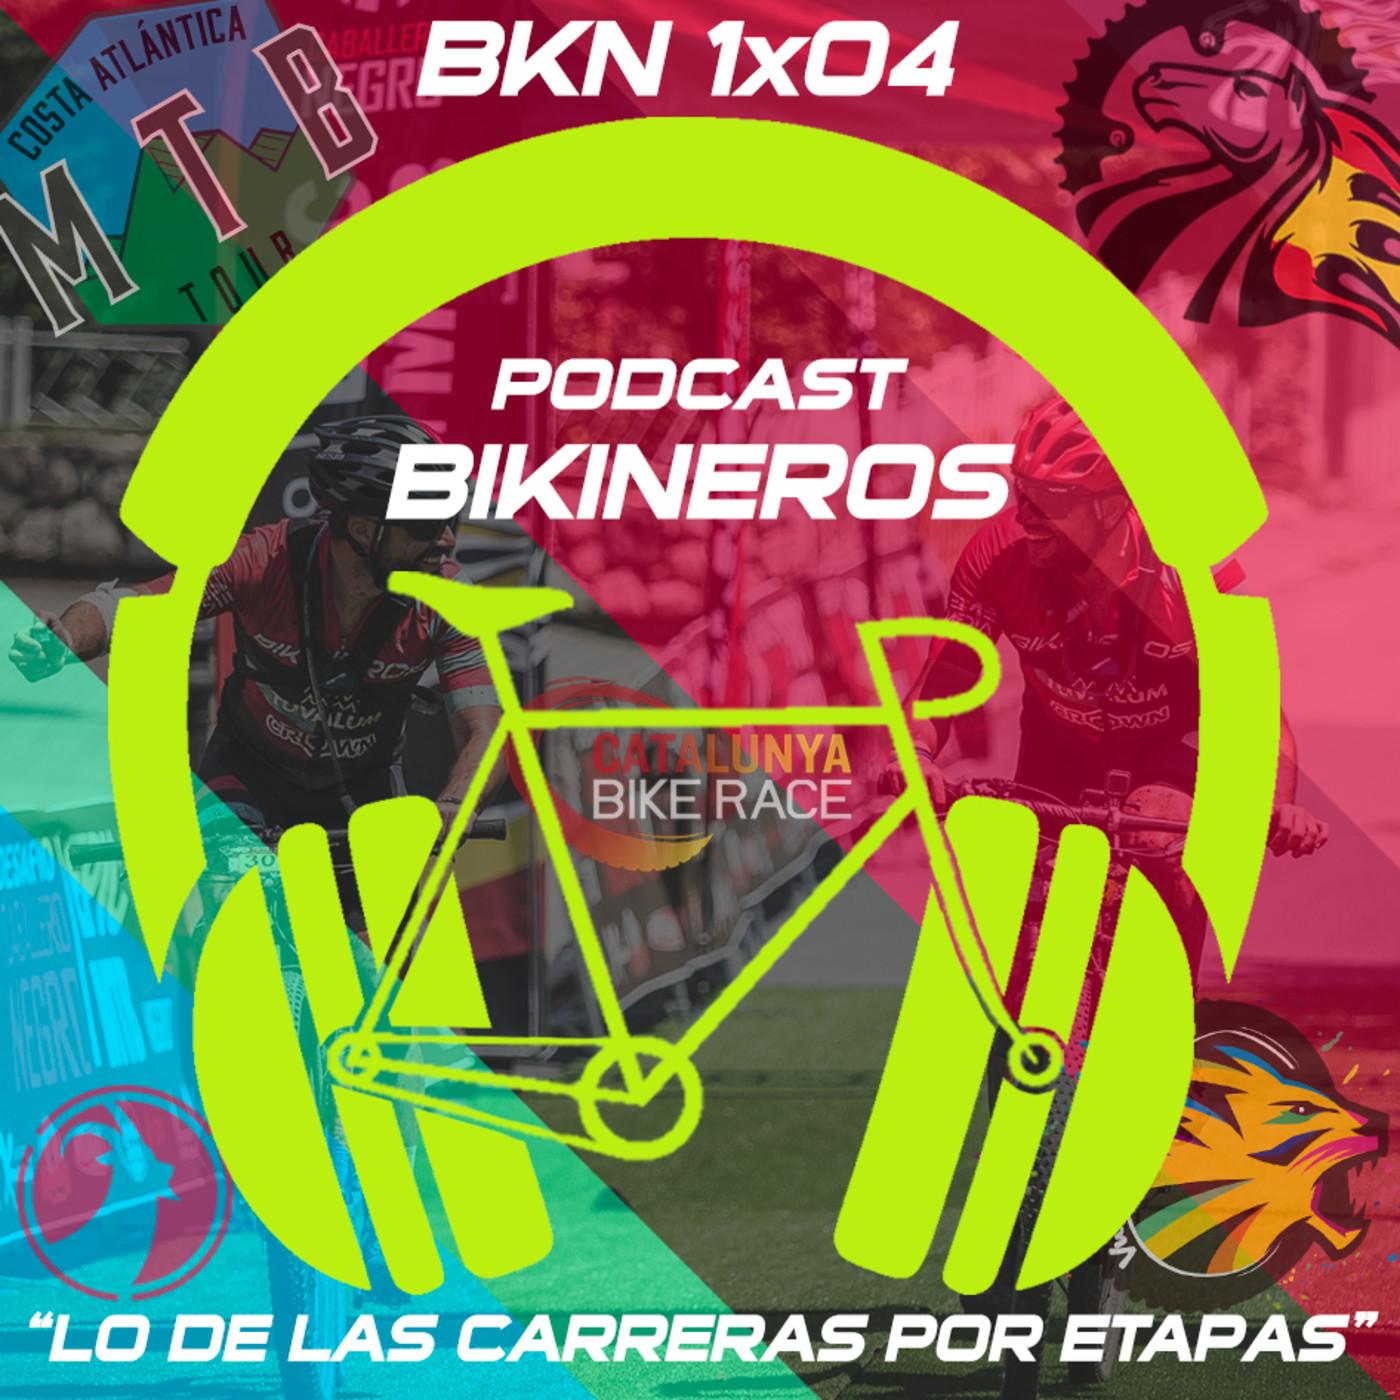 BKN 1x04: Lo de las carreras por etapas, bicis infantiles y la trompeta anal